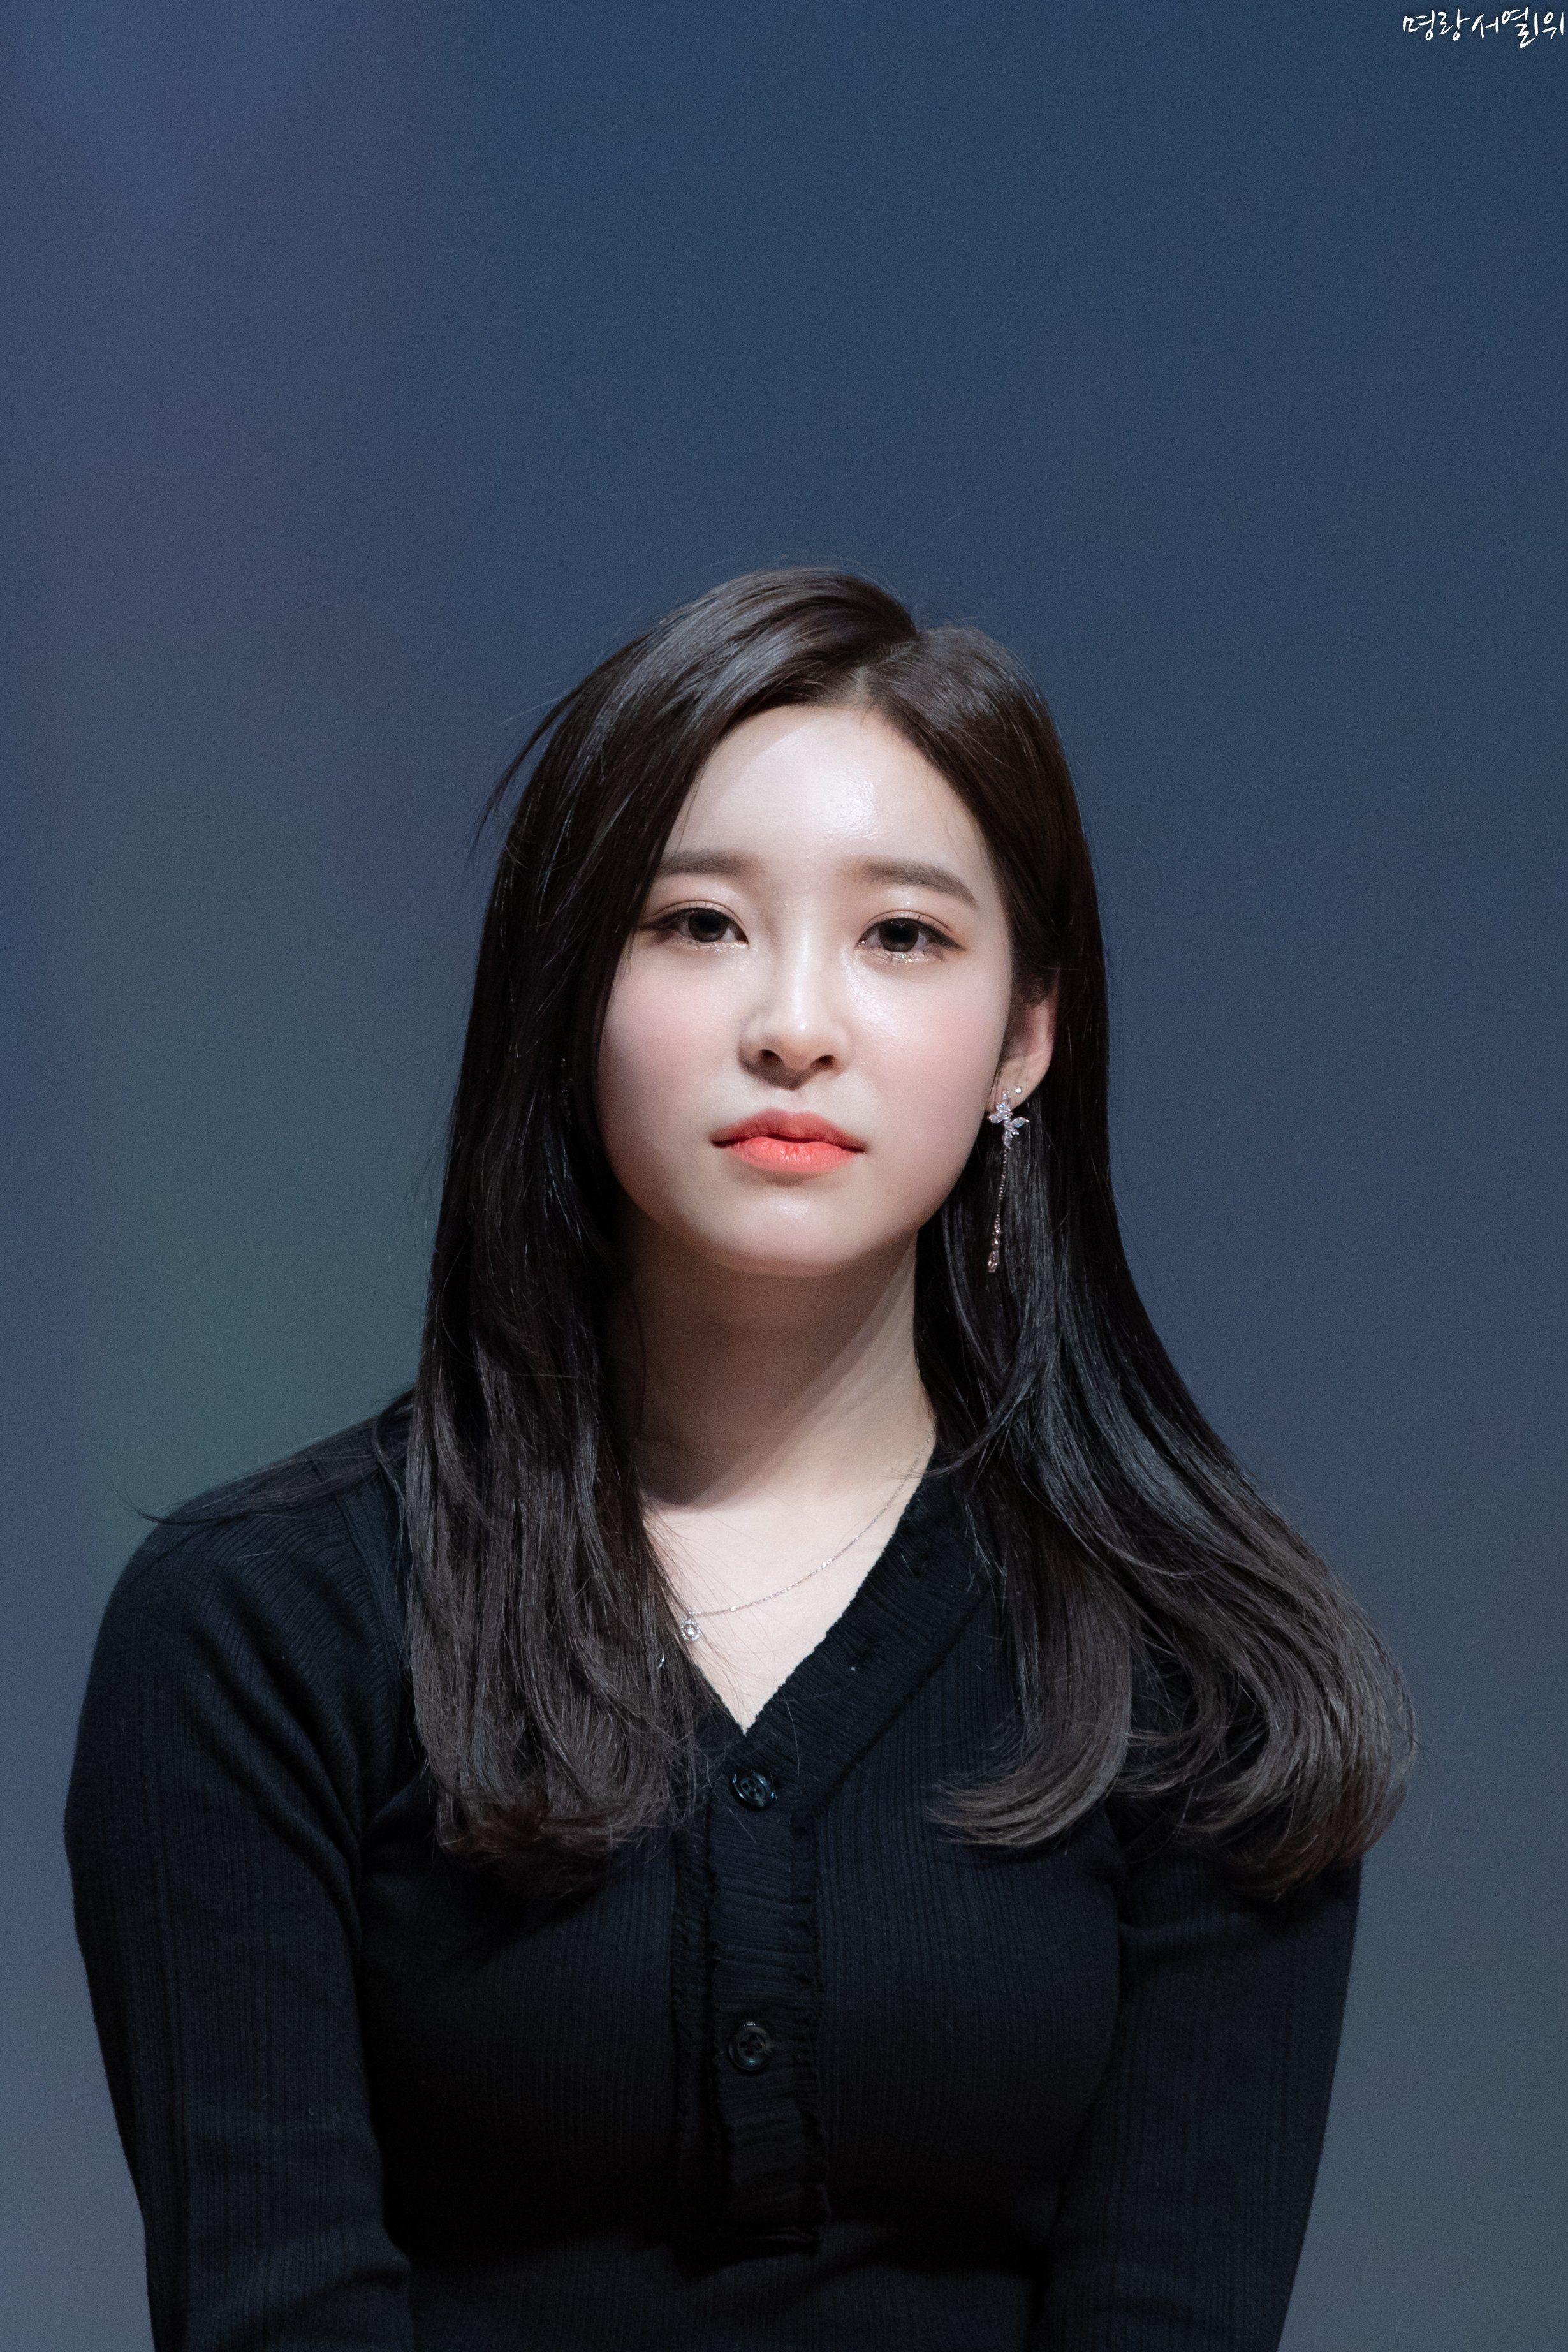 Hyeongseo Kpop Kdrama Bts Exo Kpoparmy Korean Idol Popular Music Electronic Music